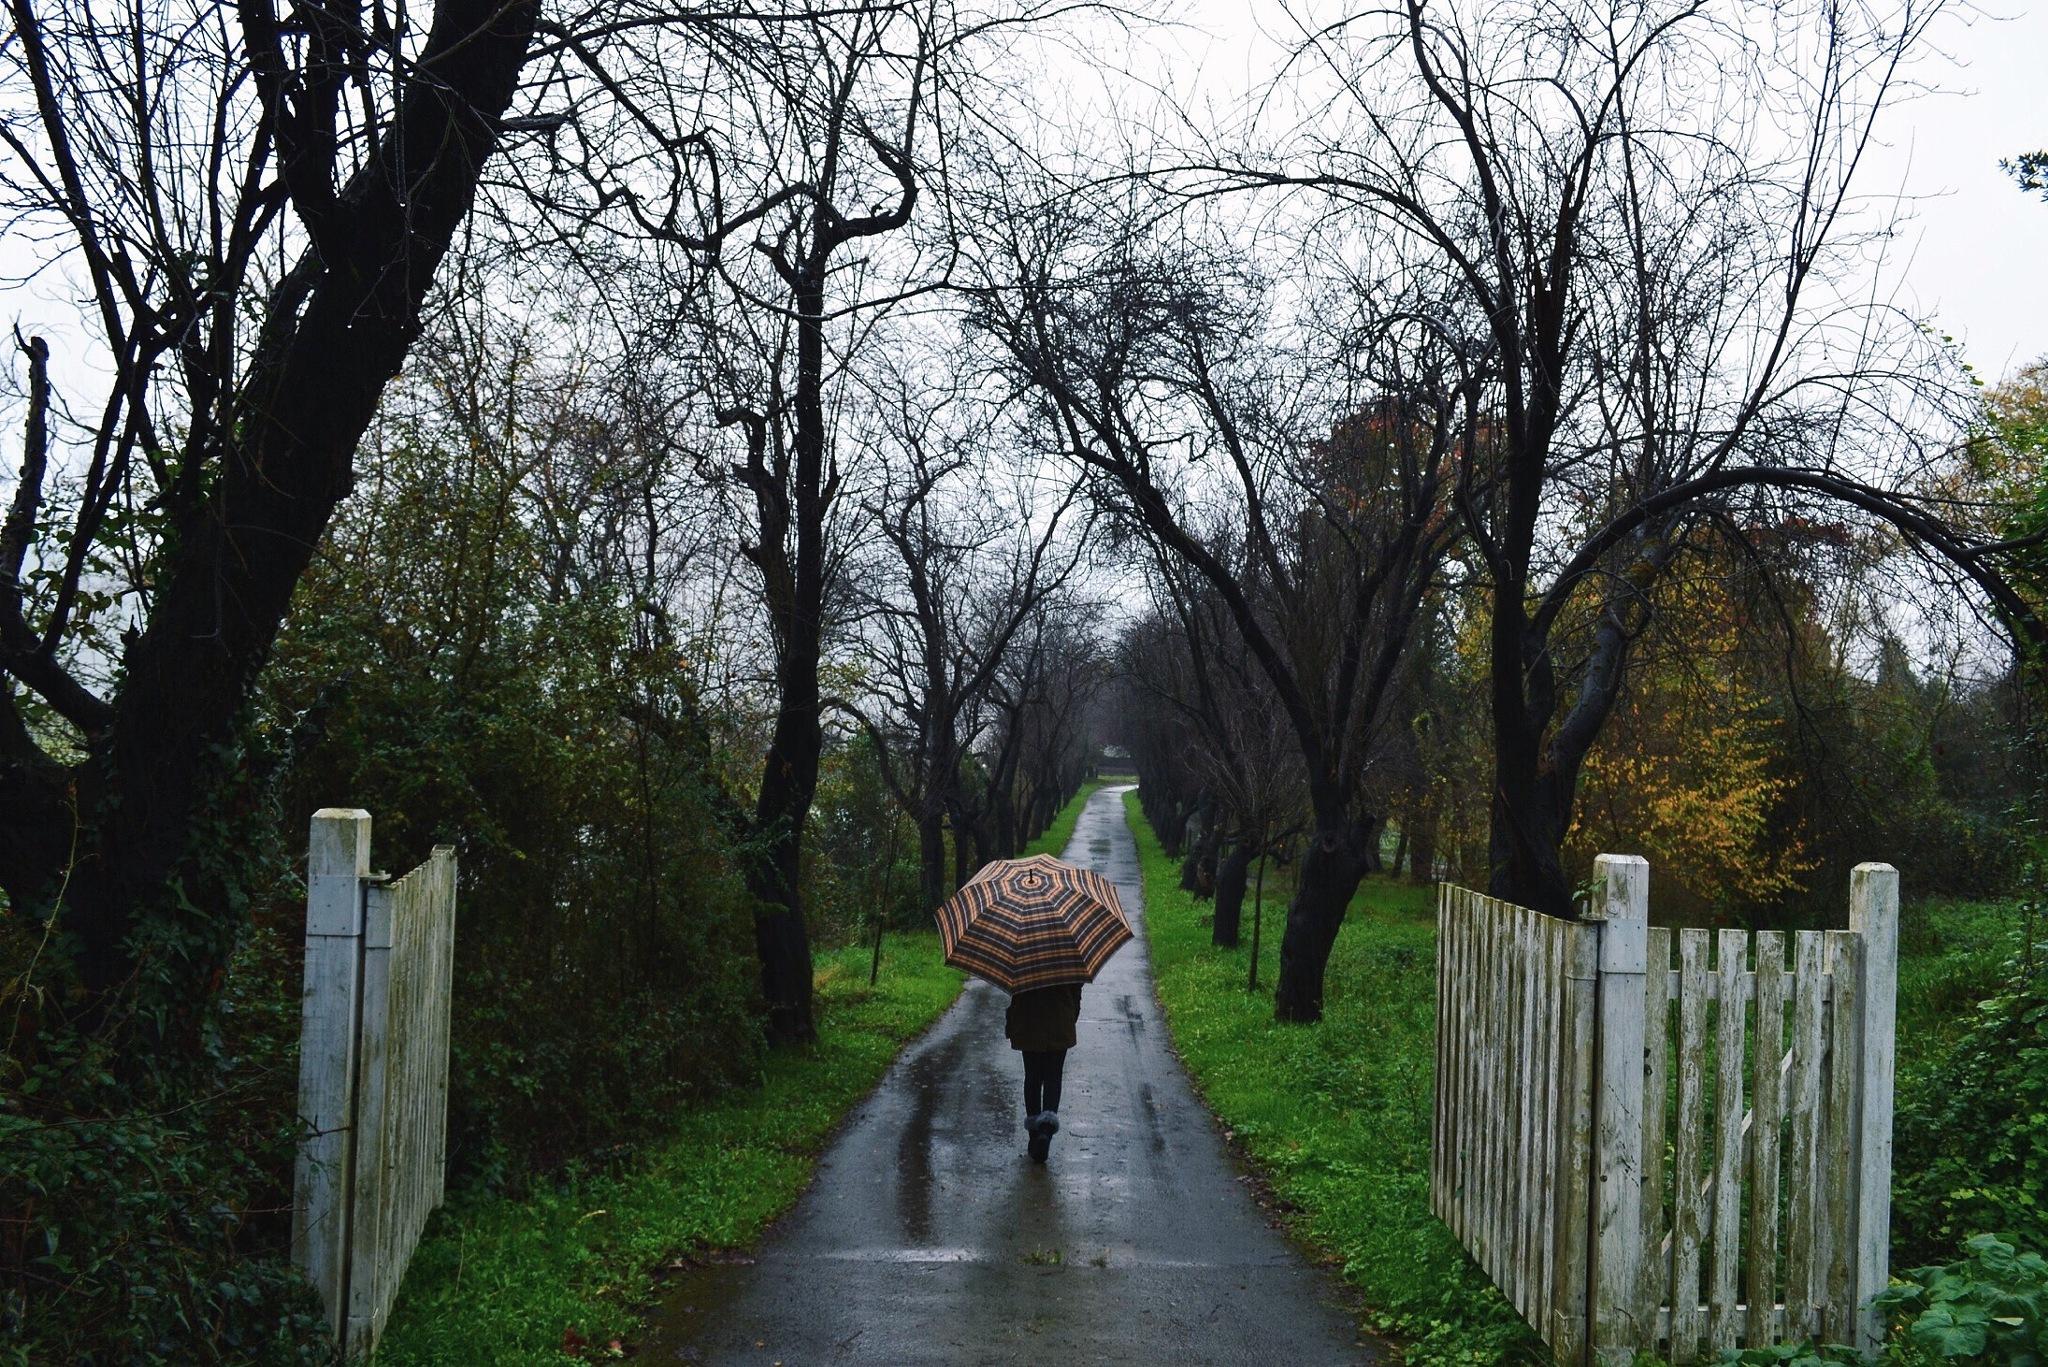 Rainy day by ElementsP